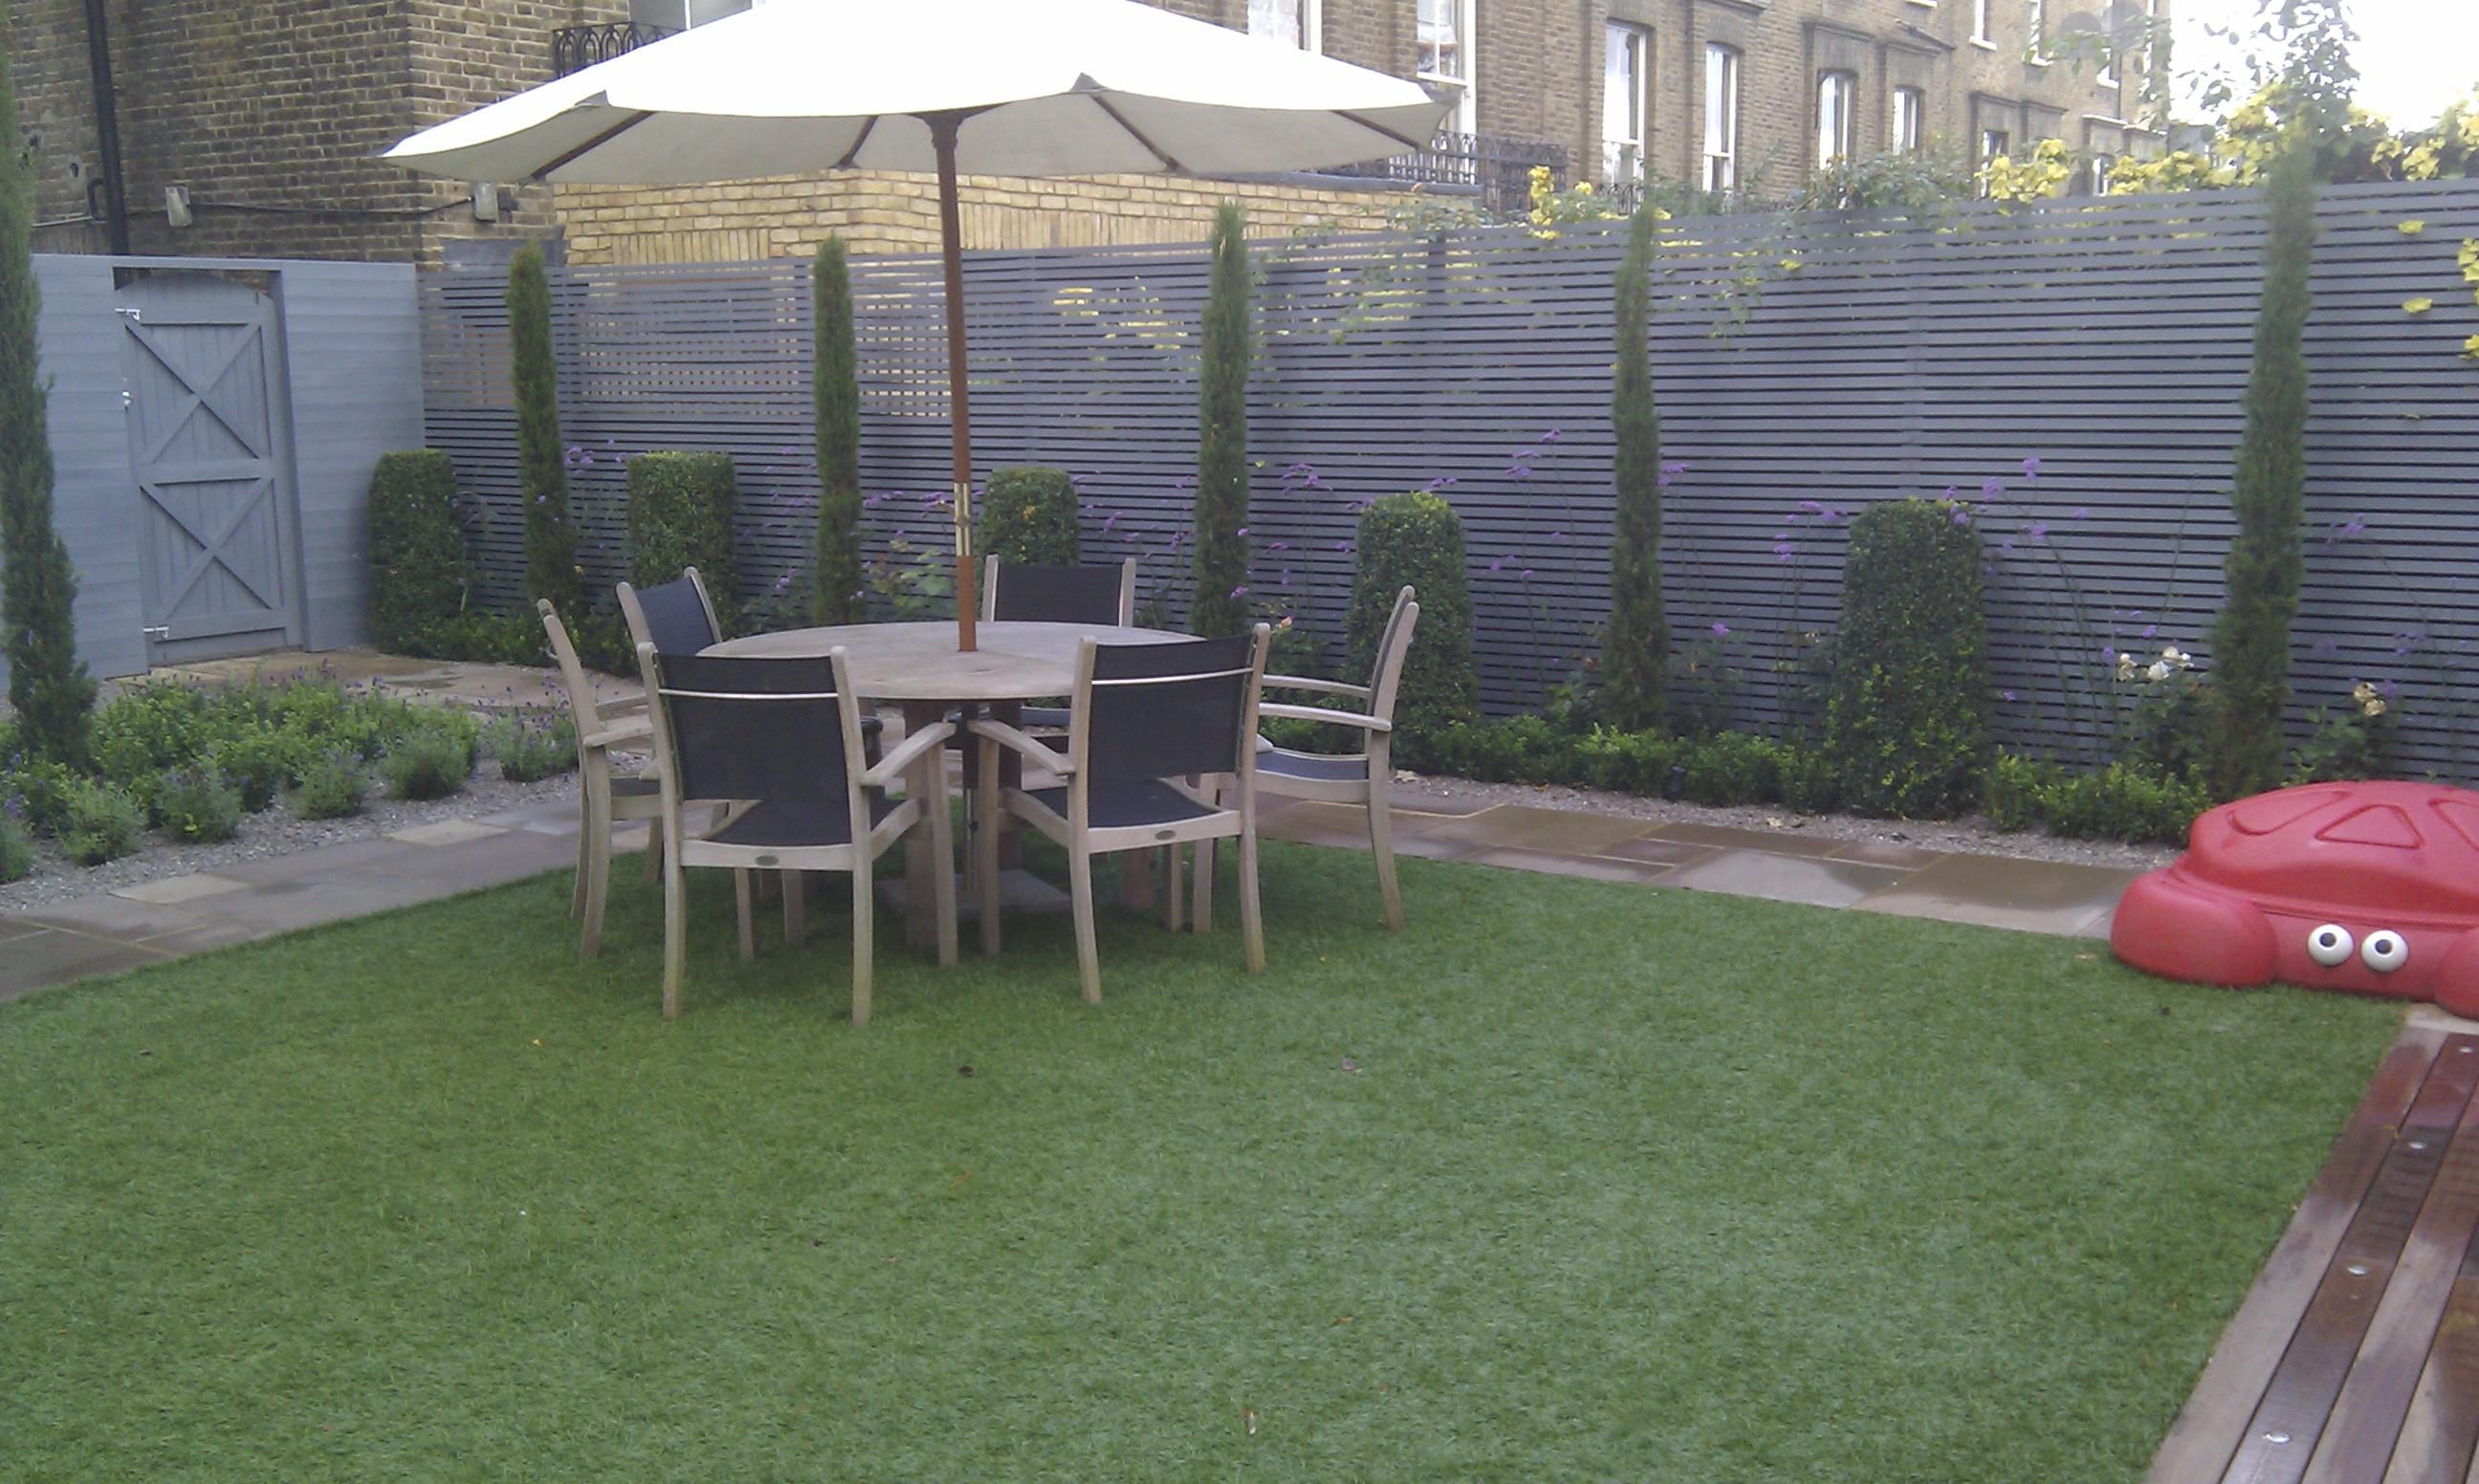 modern garden design london slatted grey privacy screen sandstone paving easy grass balau hardwood decking (35)